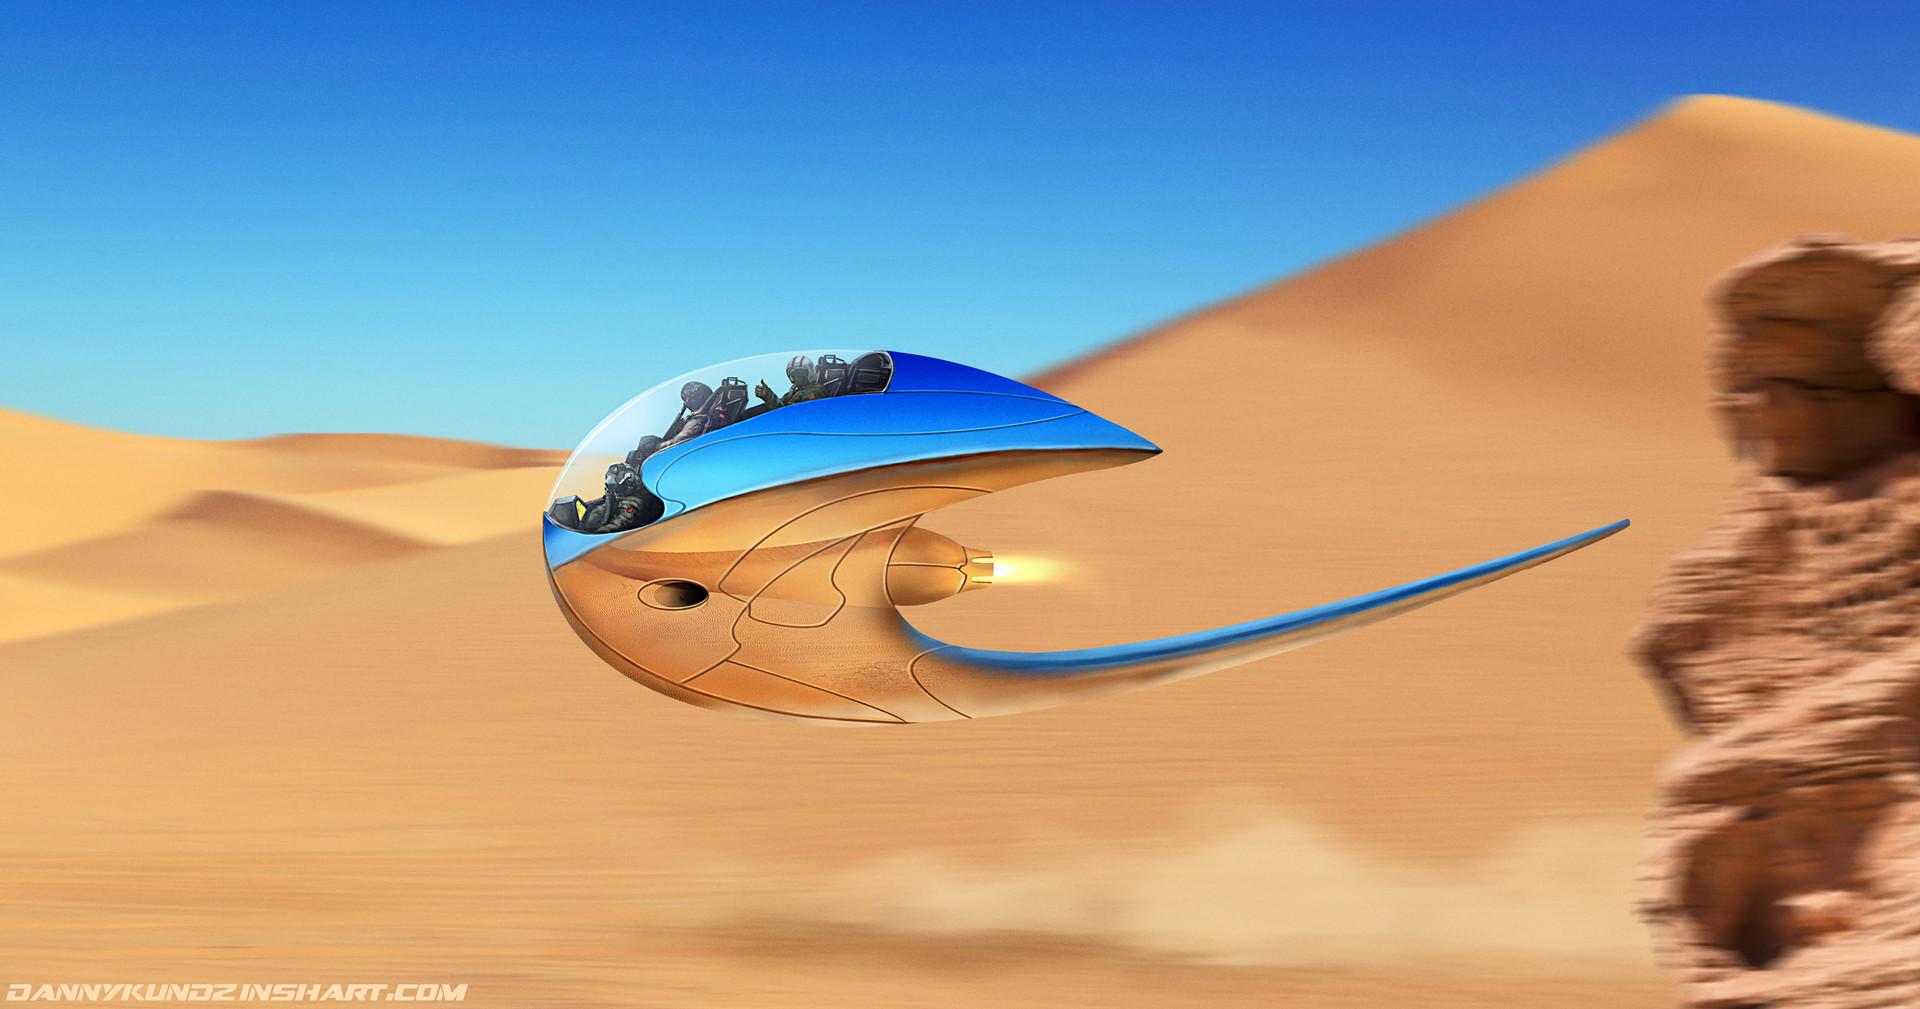 Danny kundzinsh experimental aircraft1